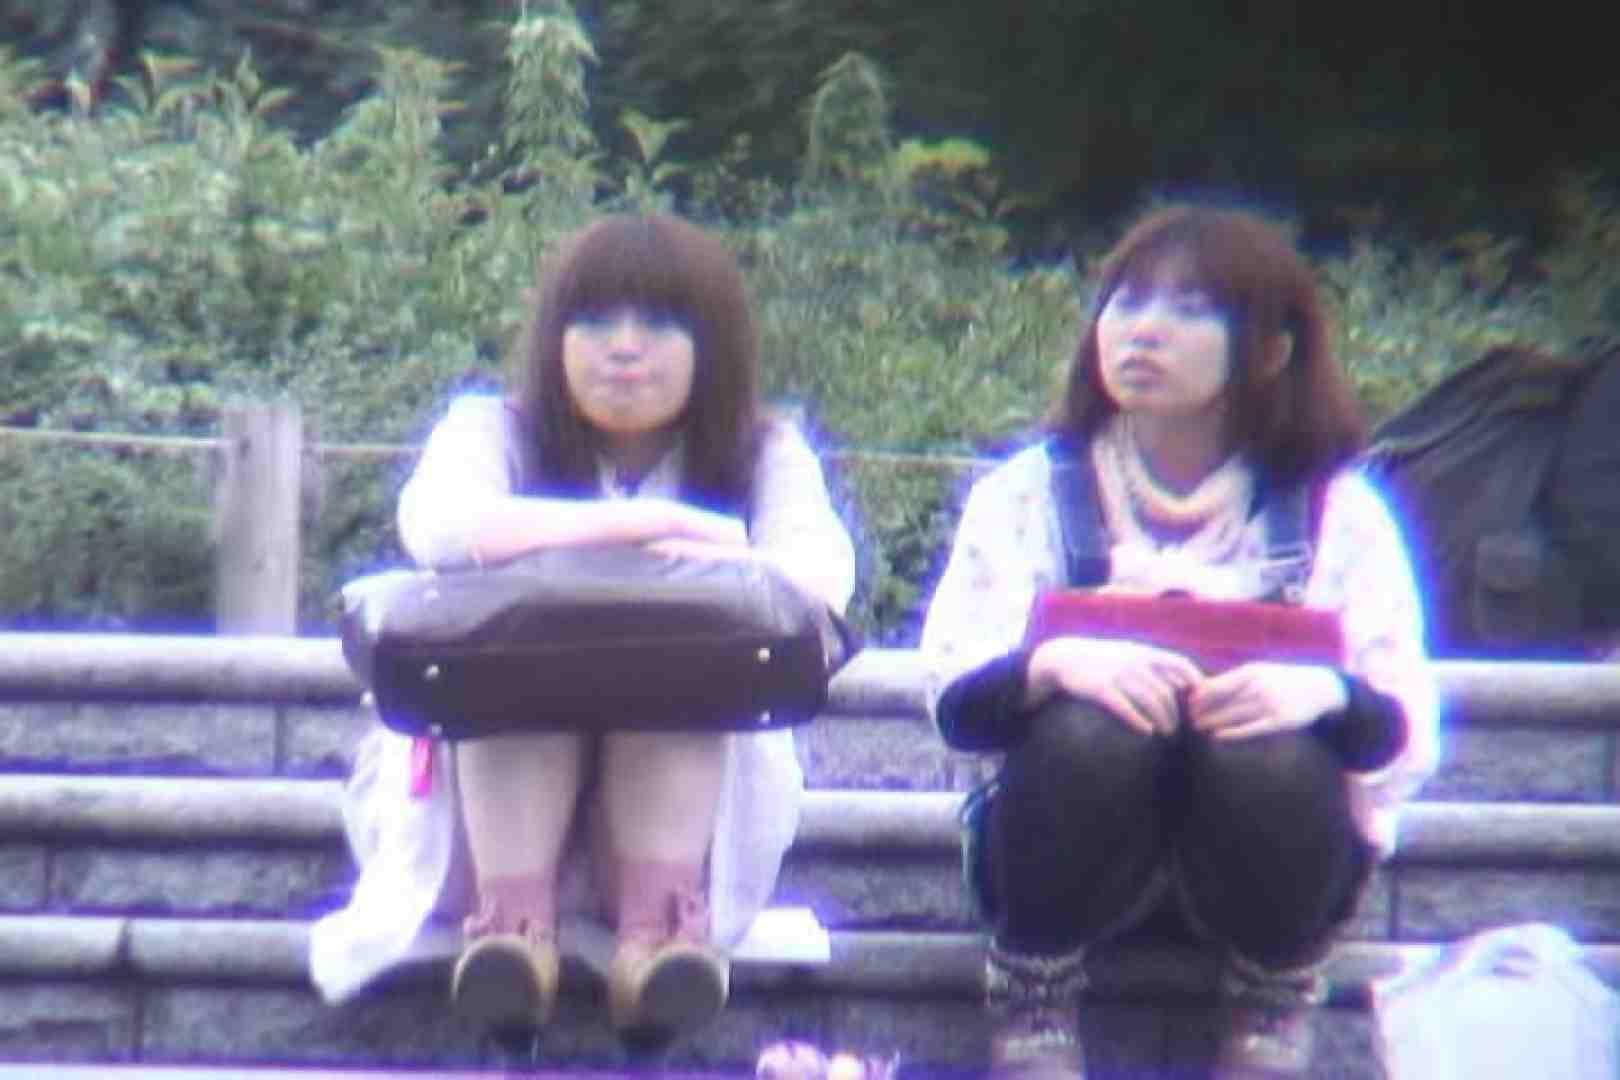 超最新版!春夏秋冬 vol.04 現役ギャル  97pic 22